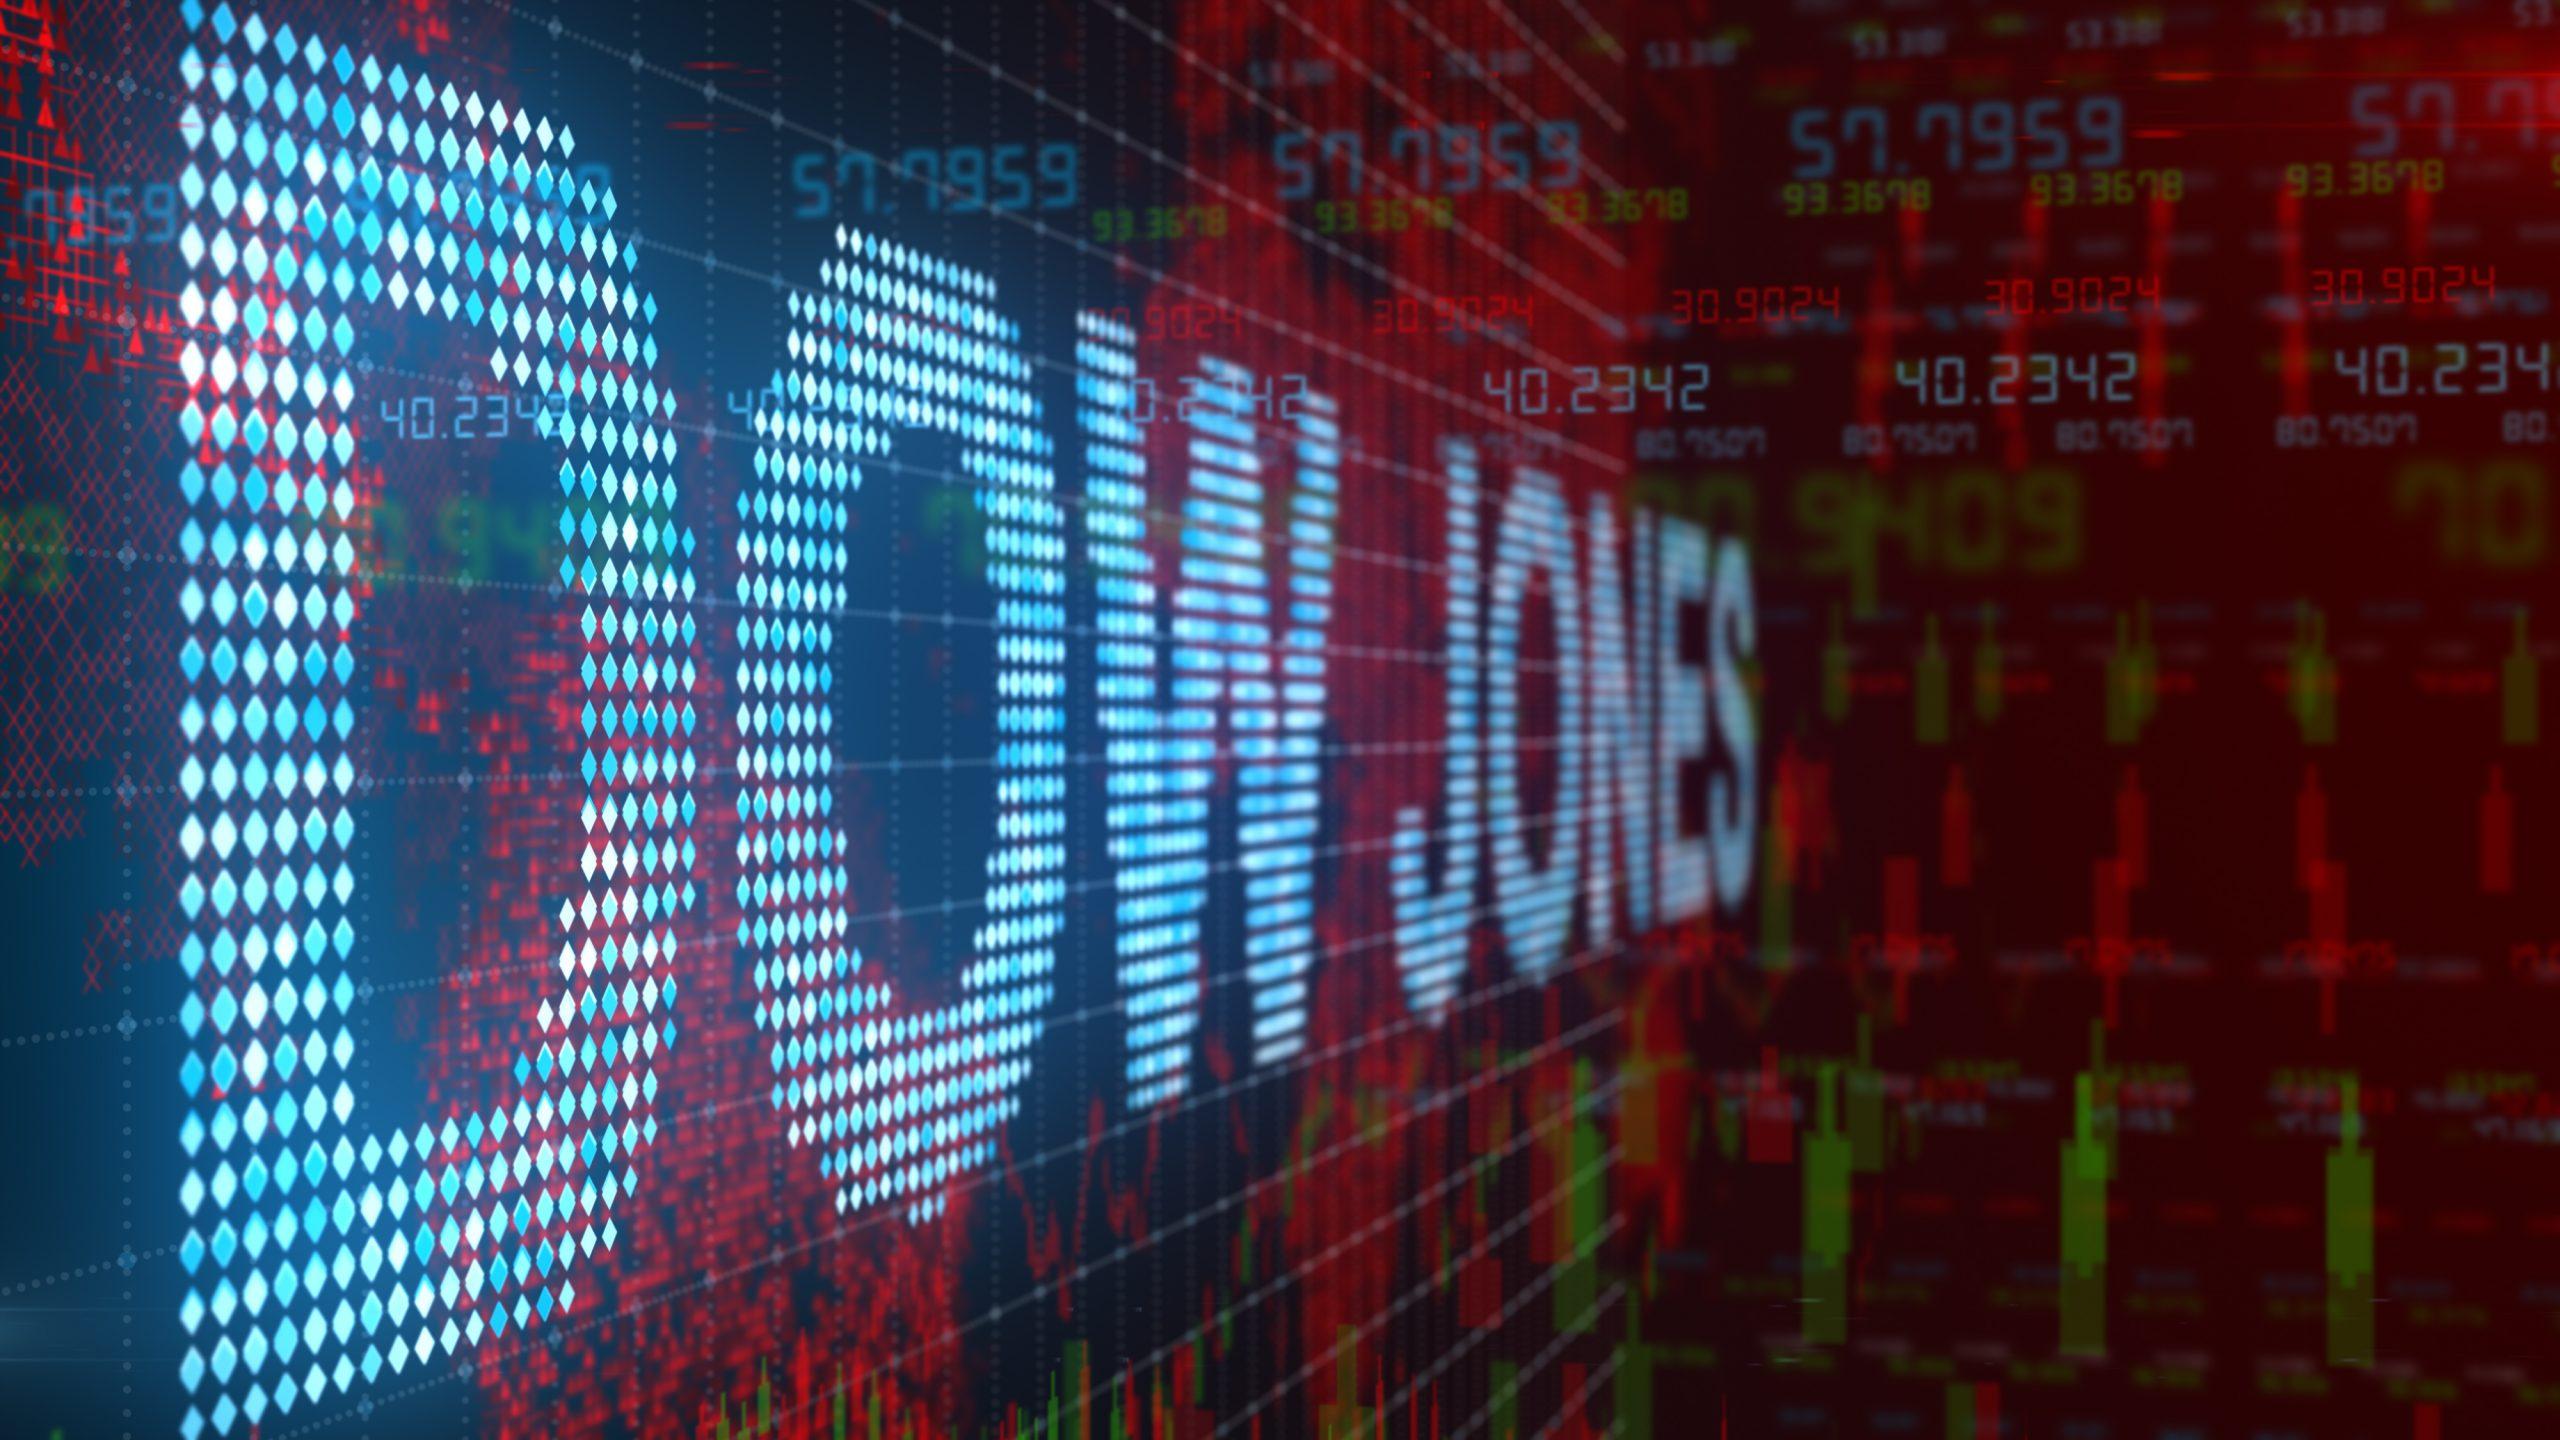 dow jones industrial average investing financial advisor recent change 2020